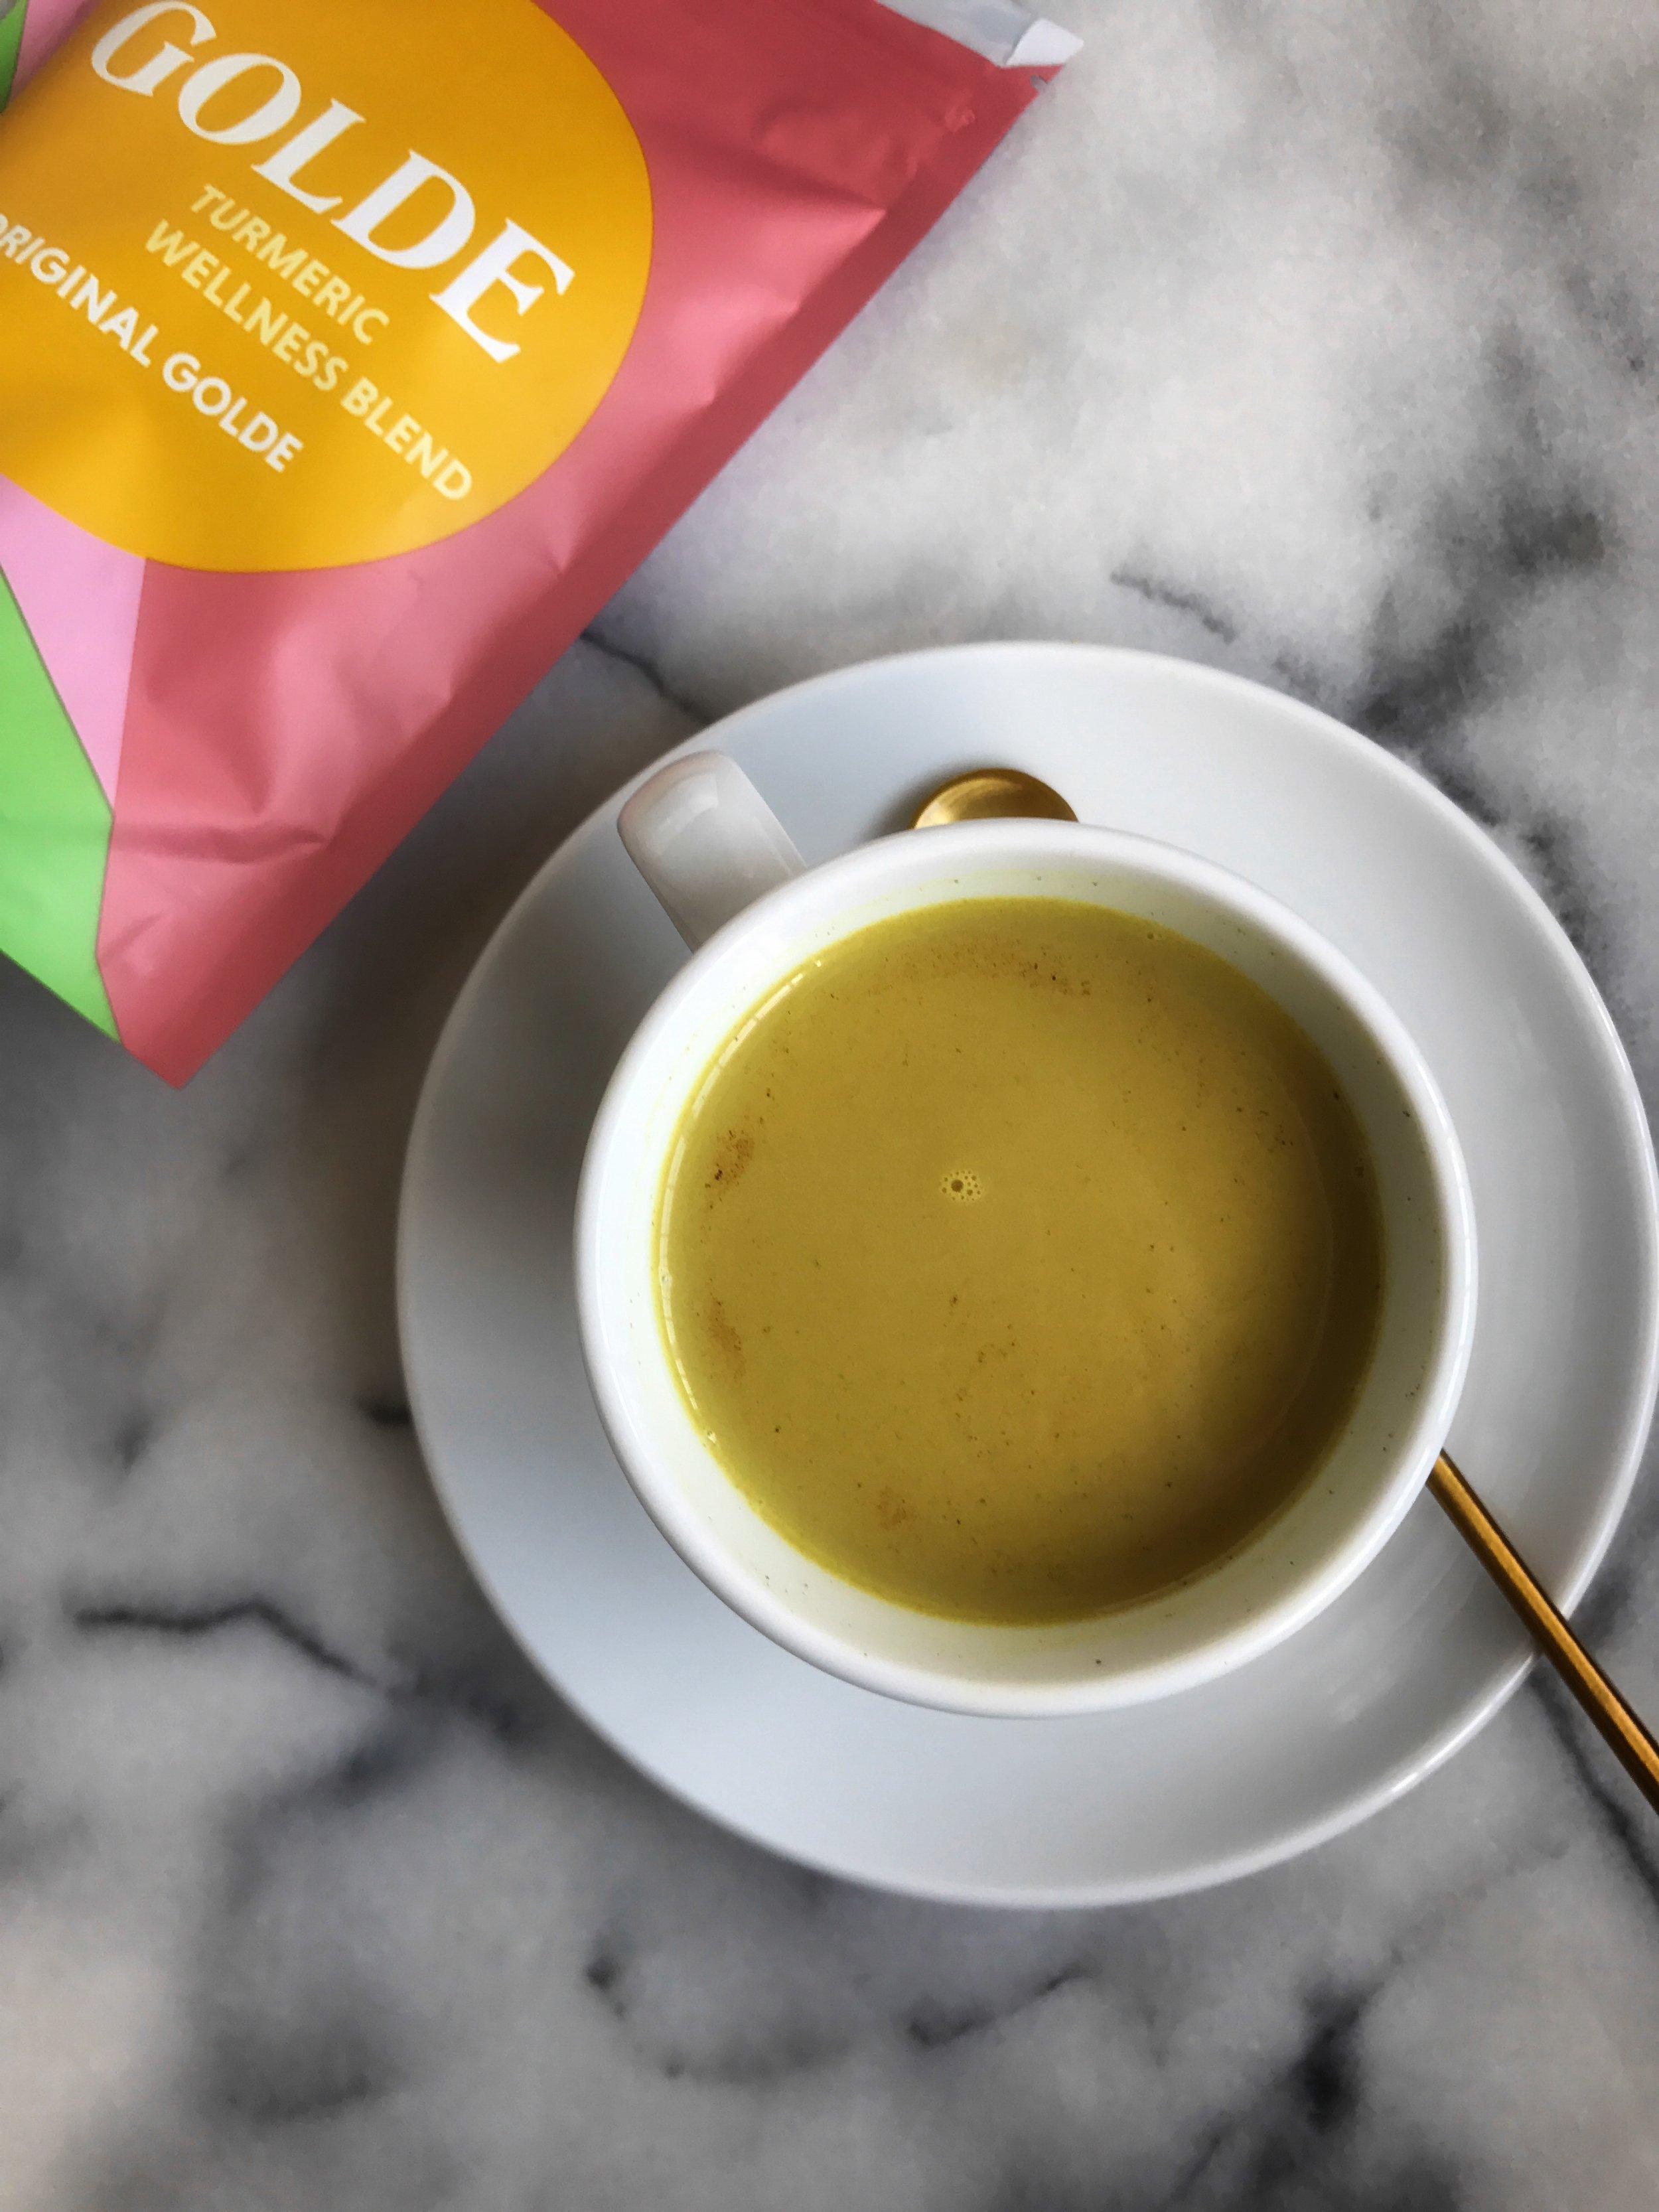 Golde golden milk latte